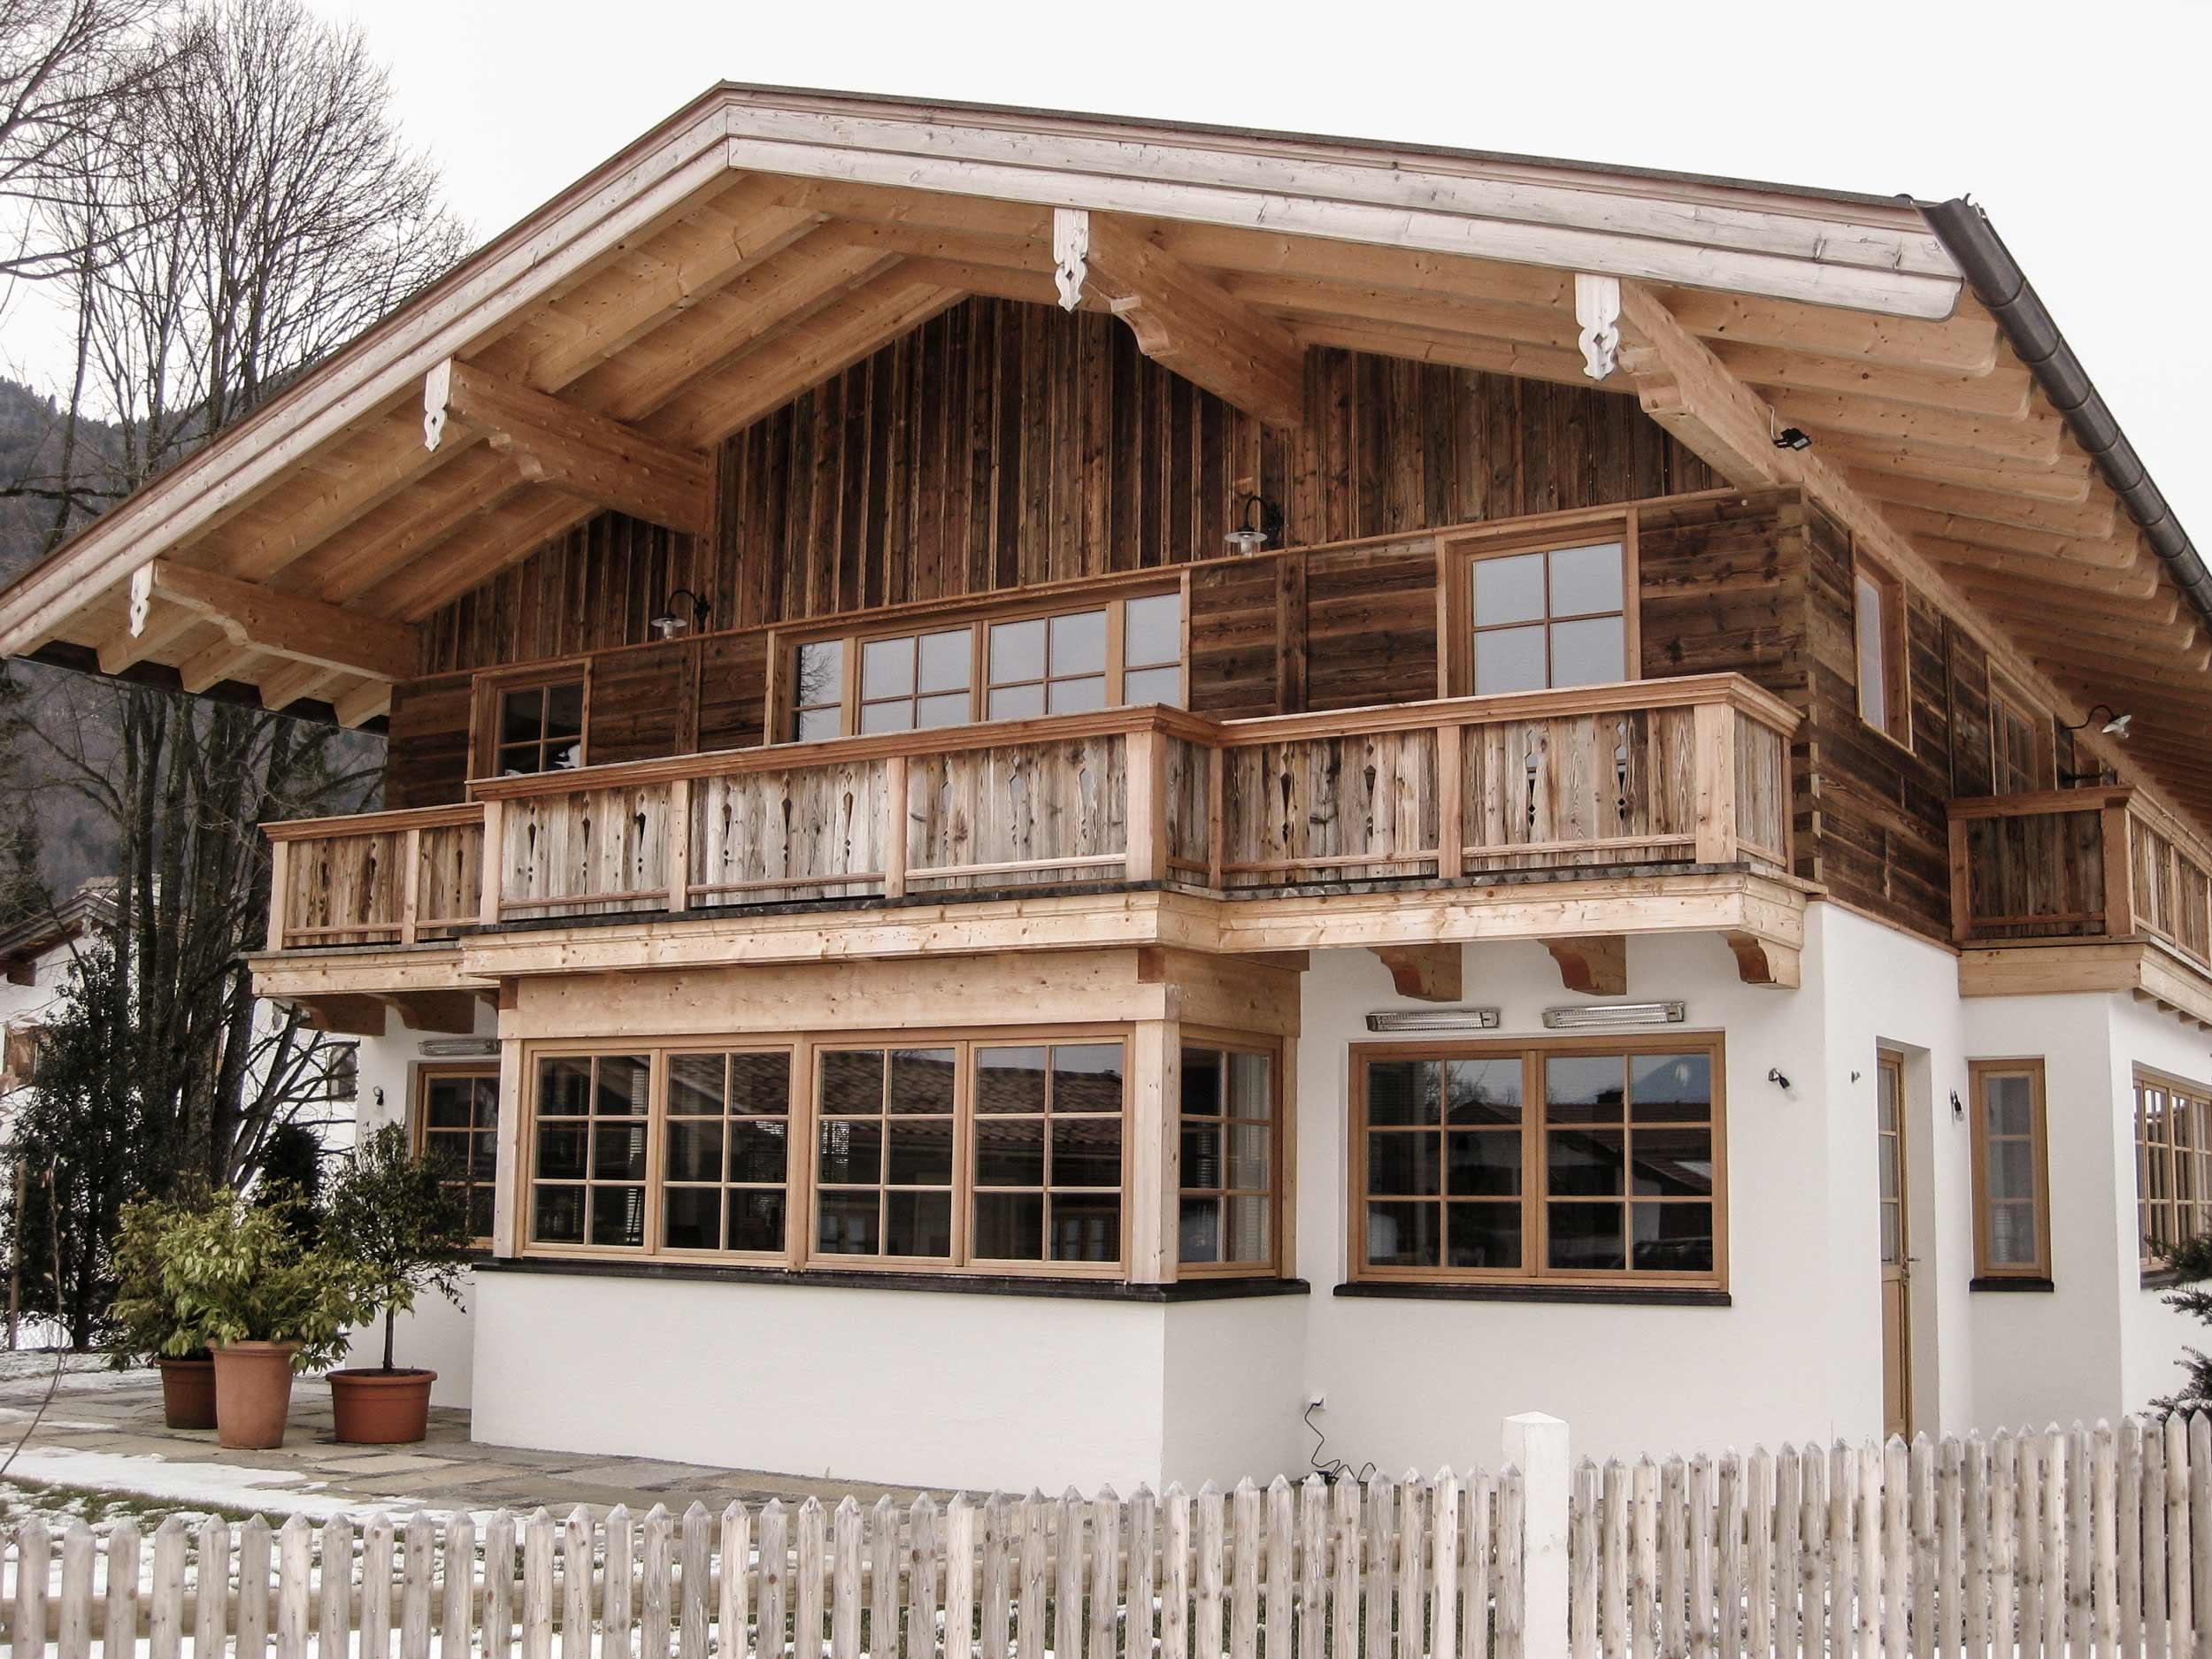 zimmerei-stoib-holzbau-holzhaus-traditionell-balkon-altholz-fassade-tegernsee-fenster-01.jpg